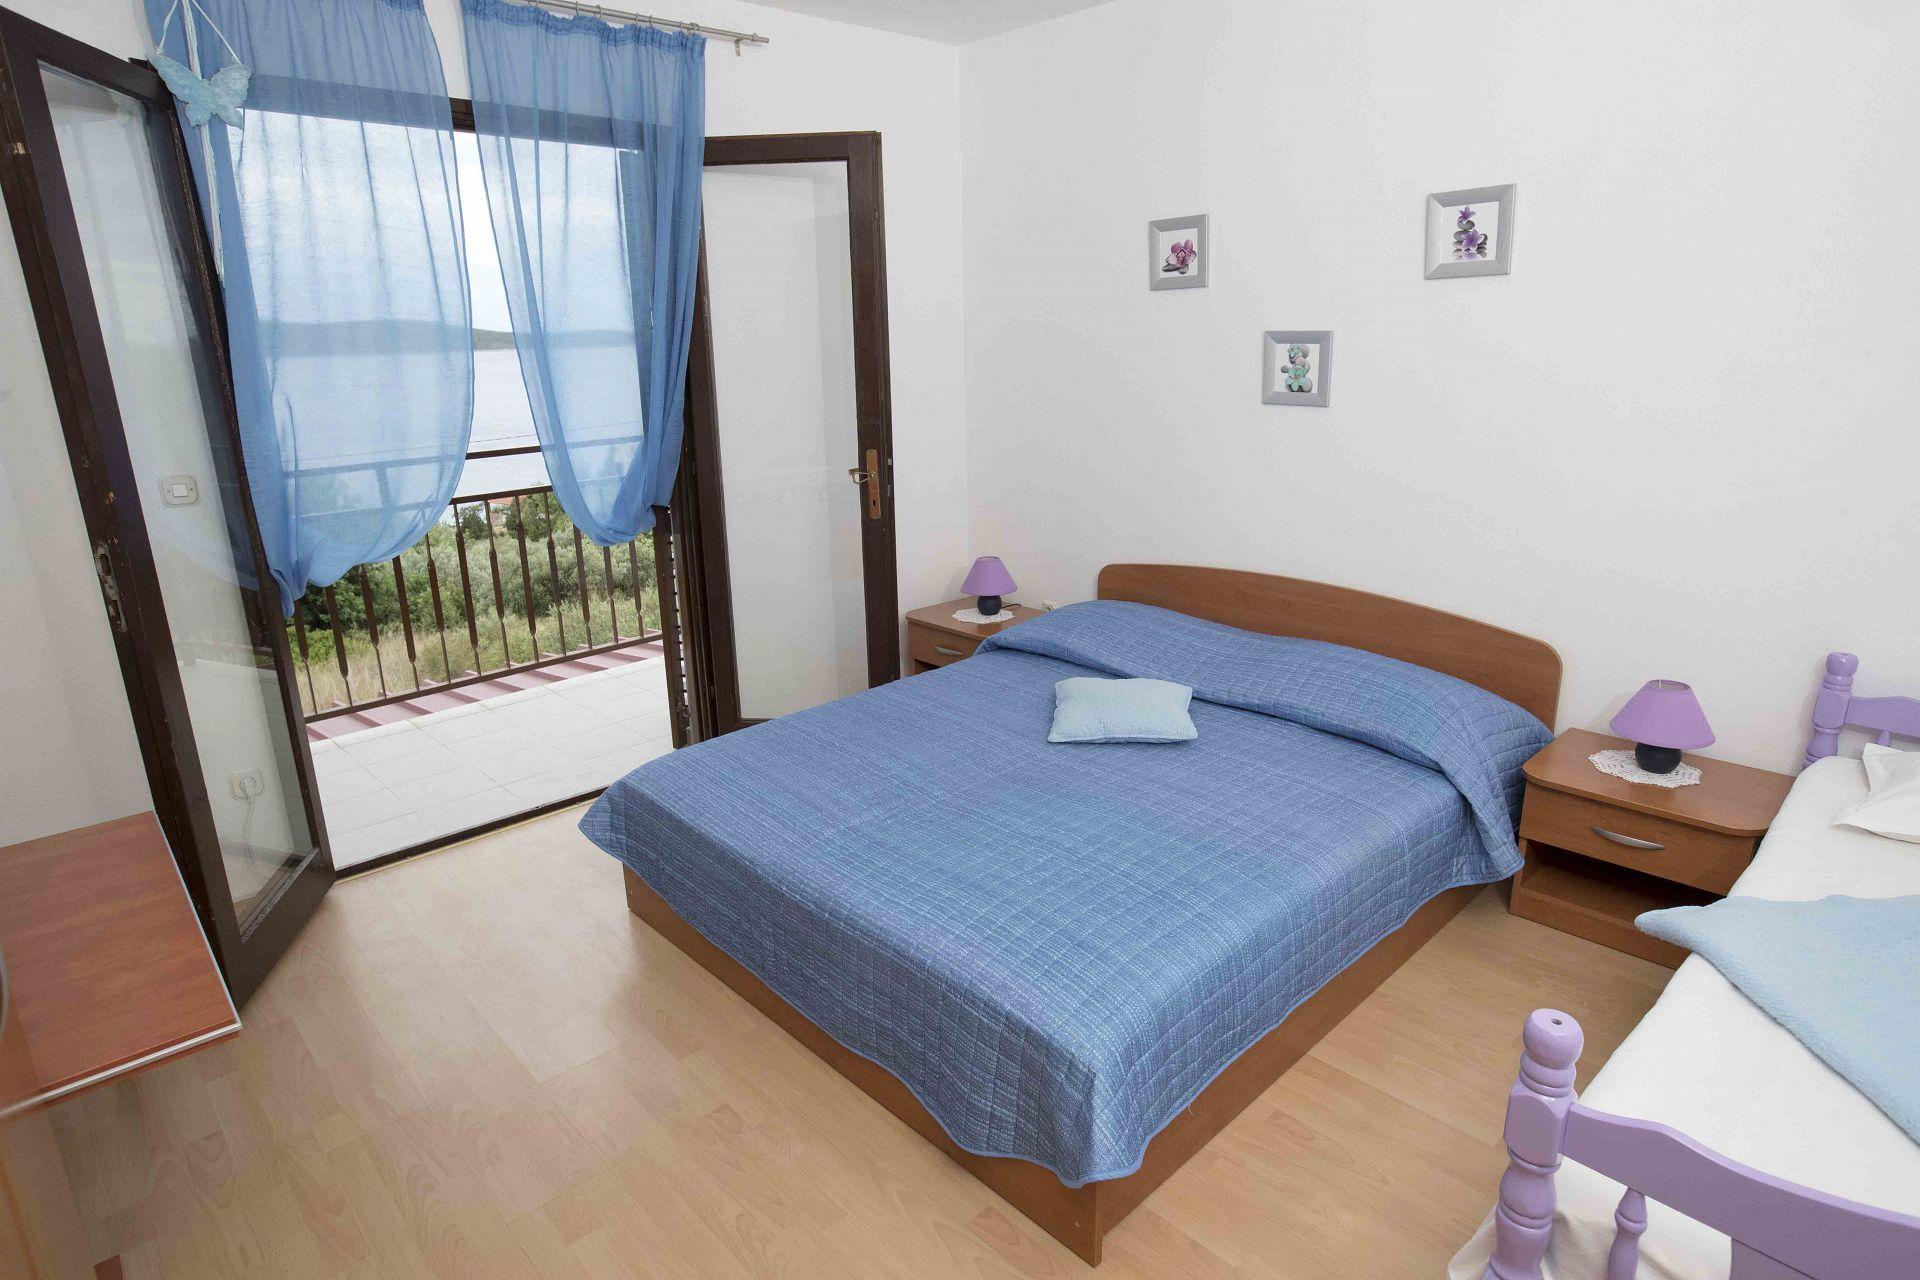 00603ZAVA - Zavala - Appartementen Kroatië - Tonia(4+1): slaapkamer